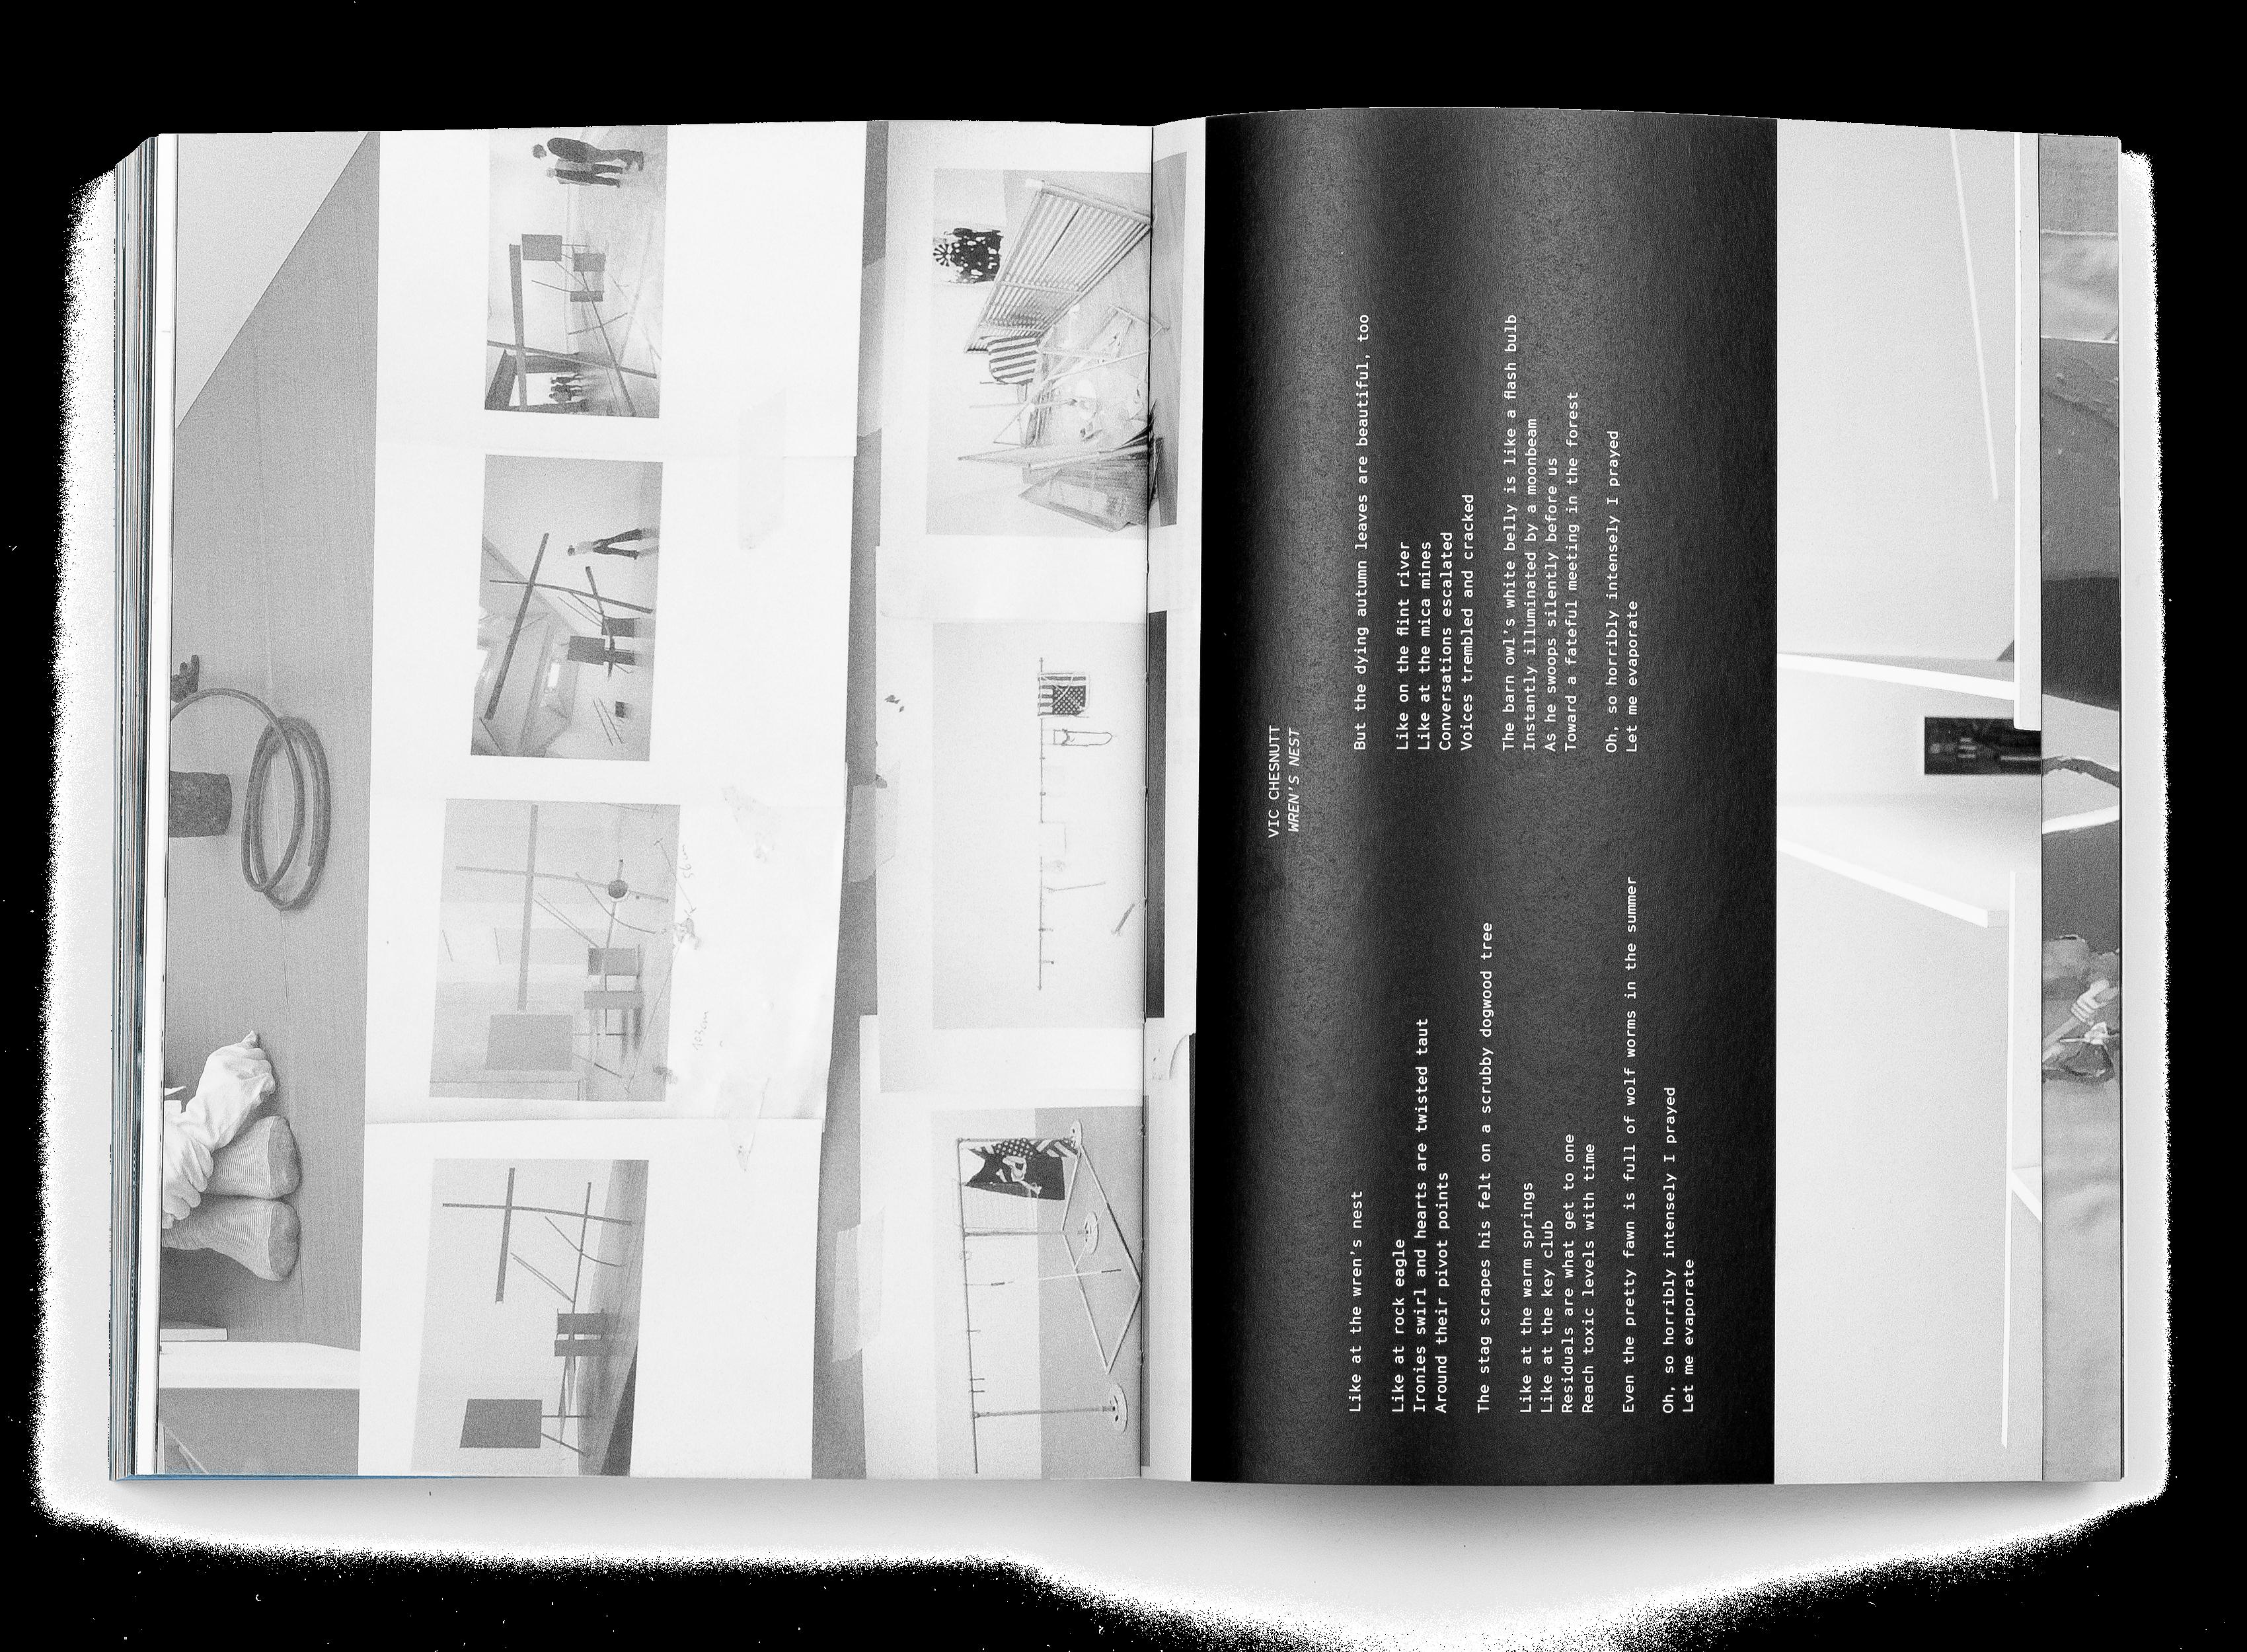 Double page du livre de Mathis Gasser, In the Museum 1 2 3, Regulators 1 2 n